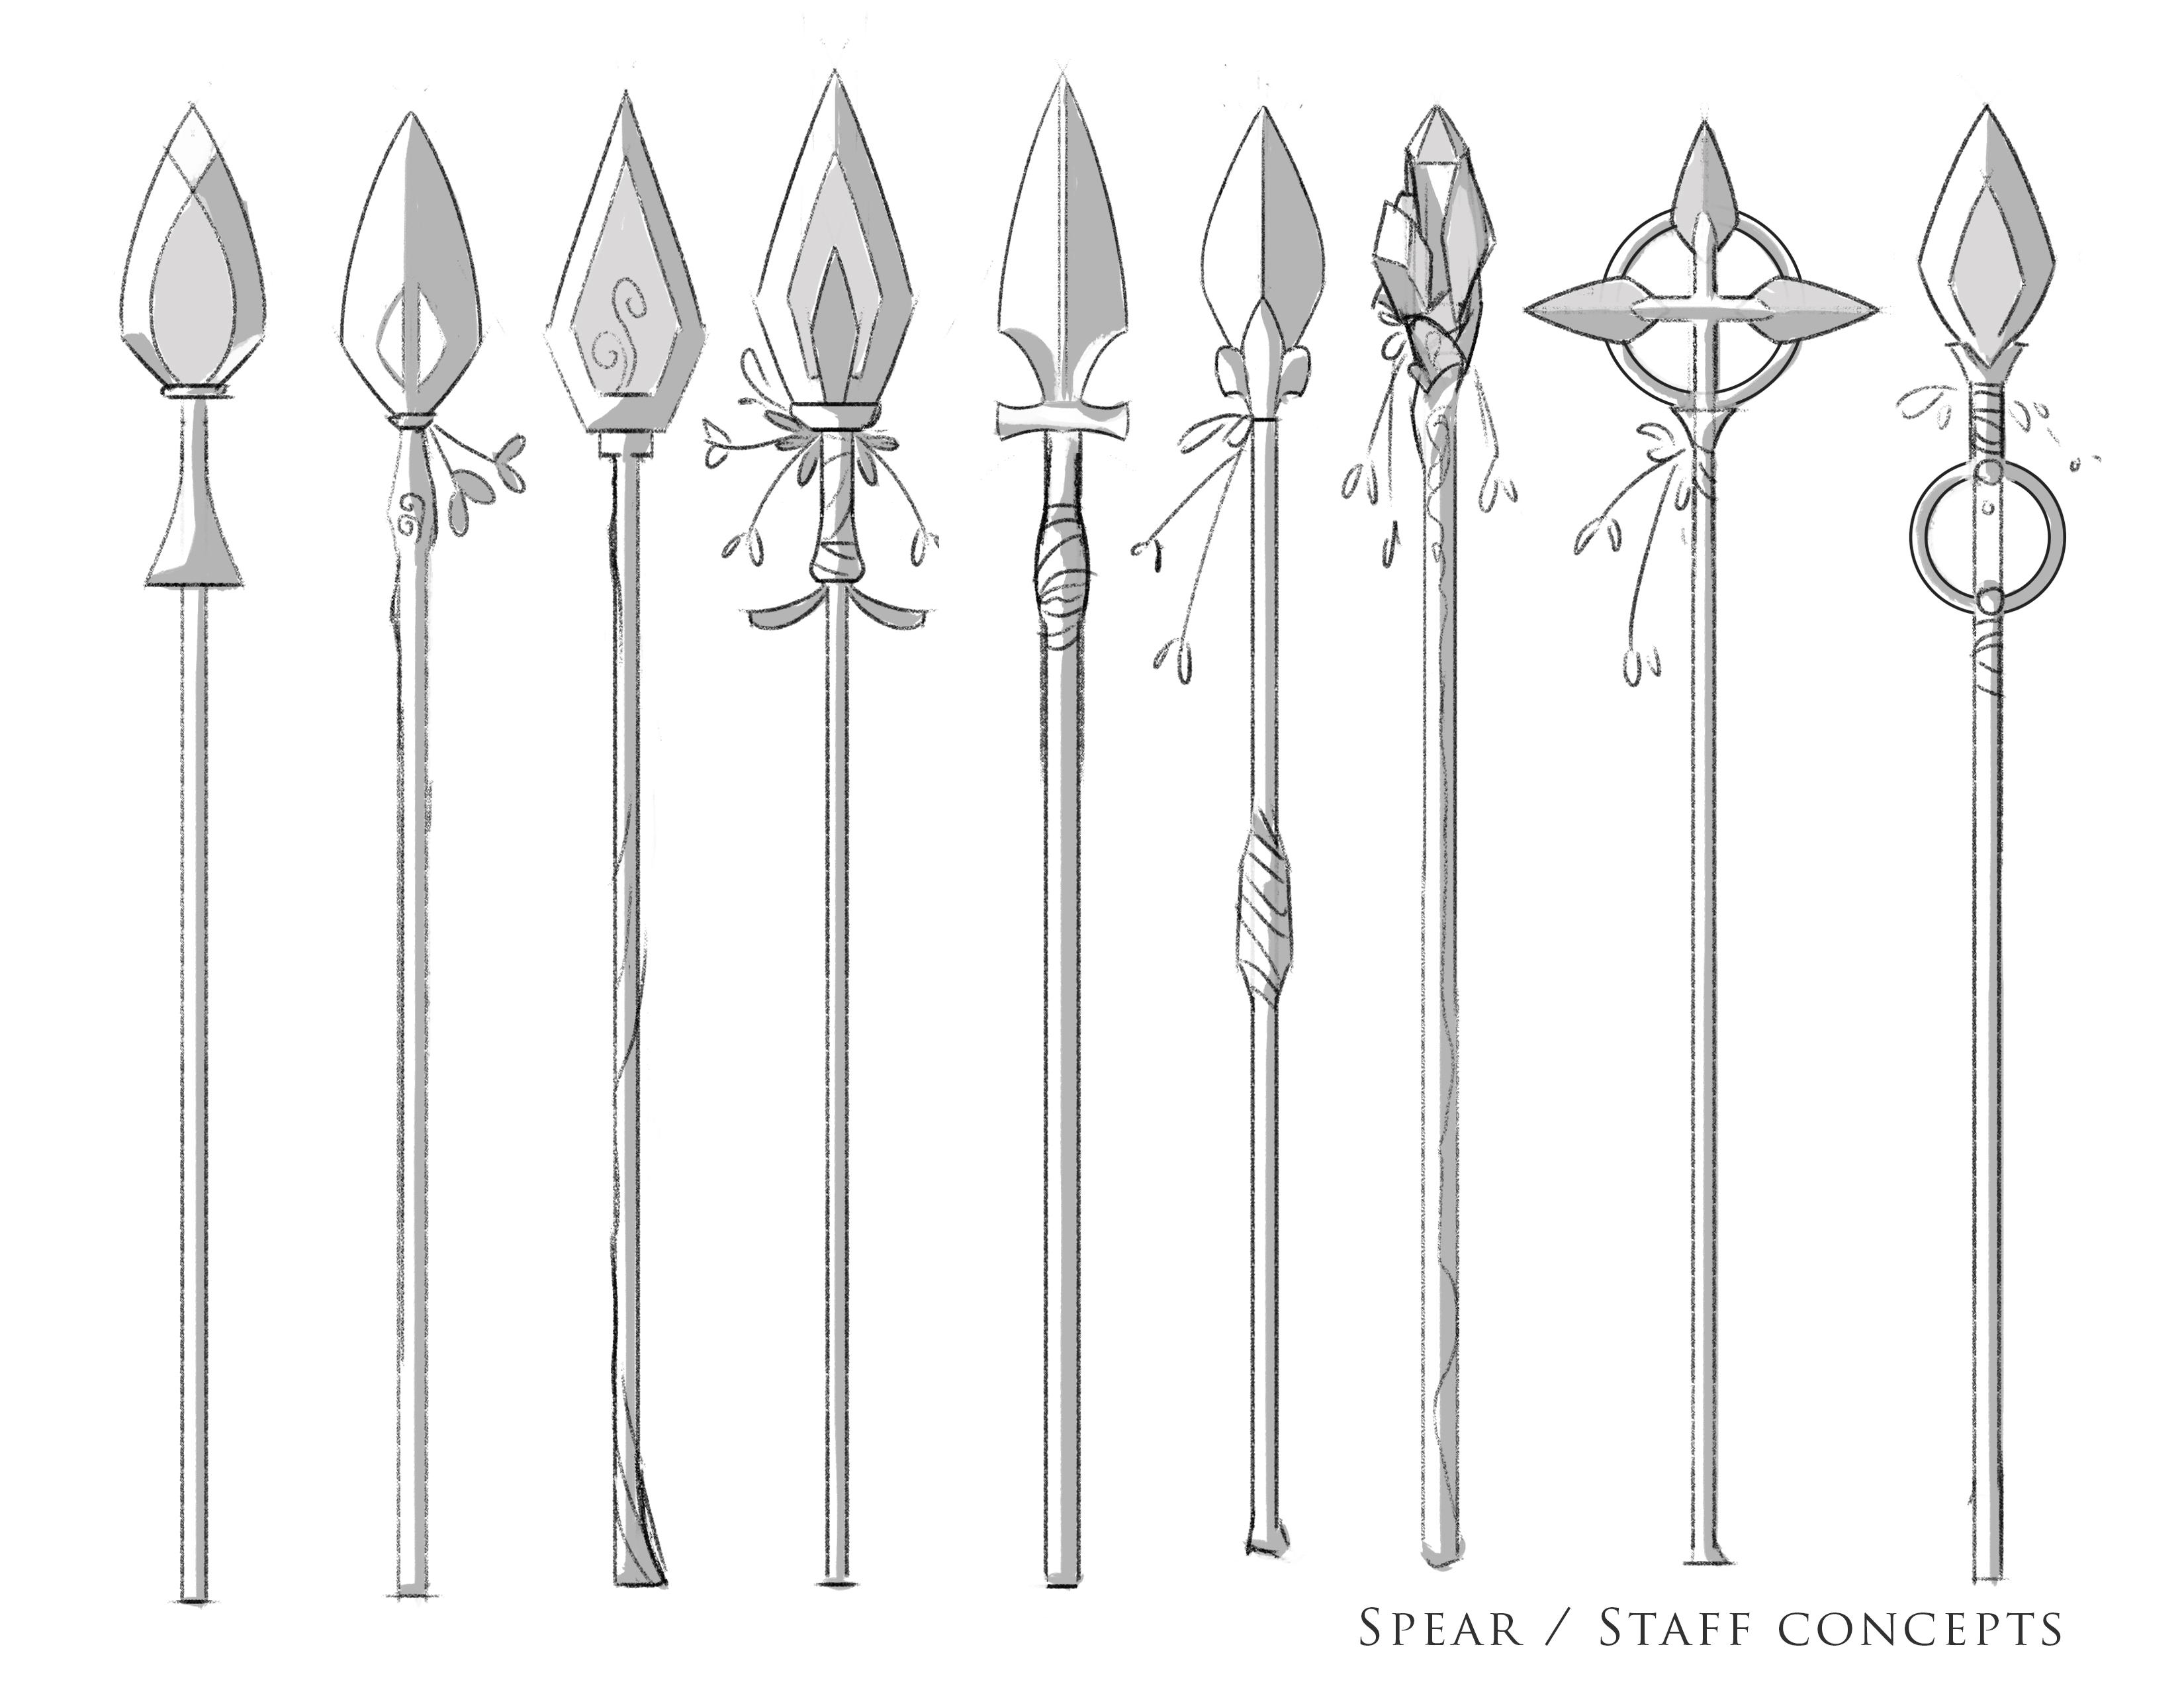 Spear Concept Design